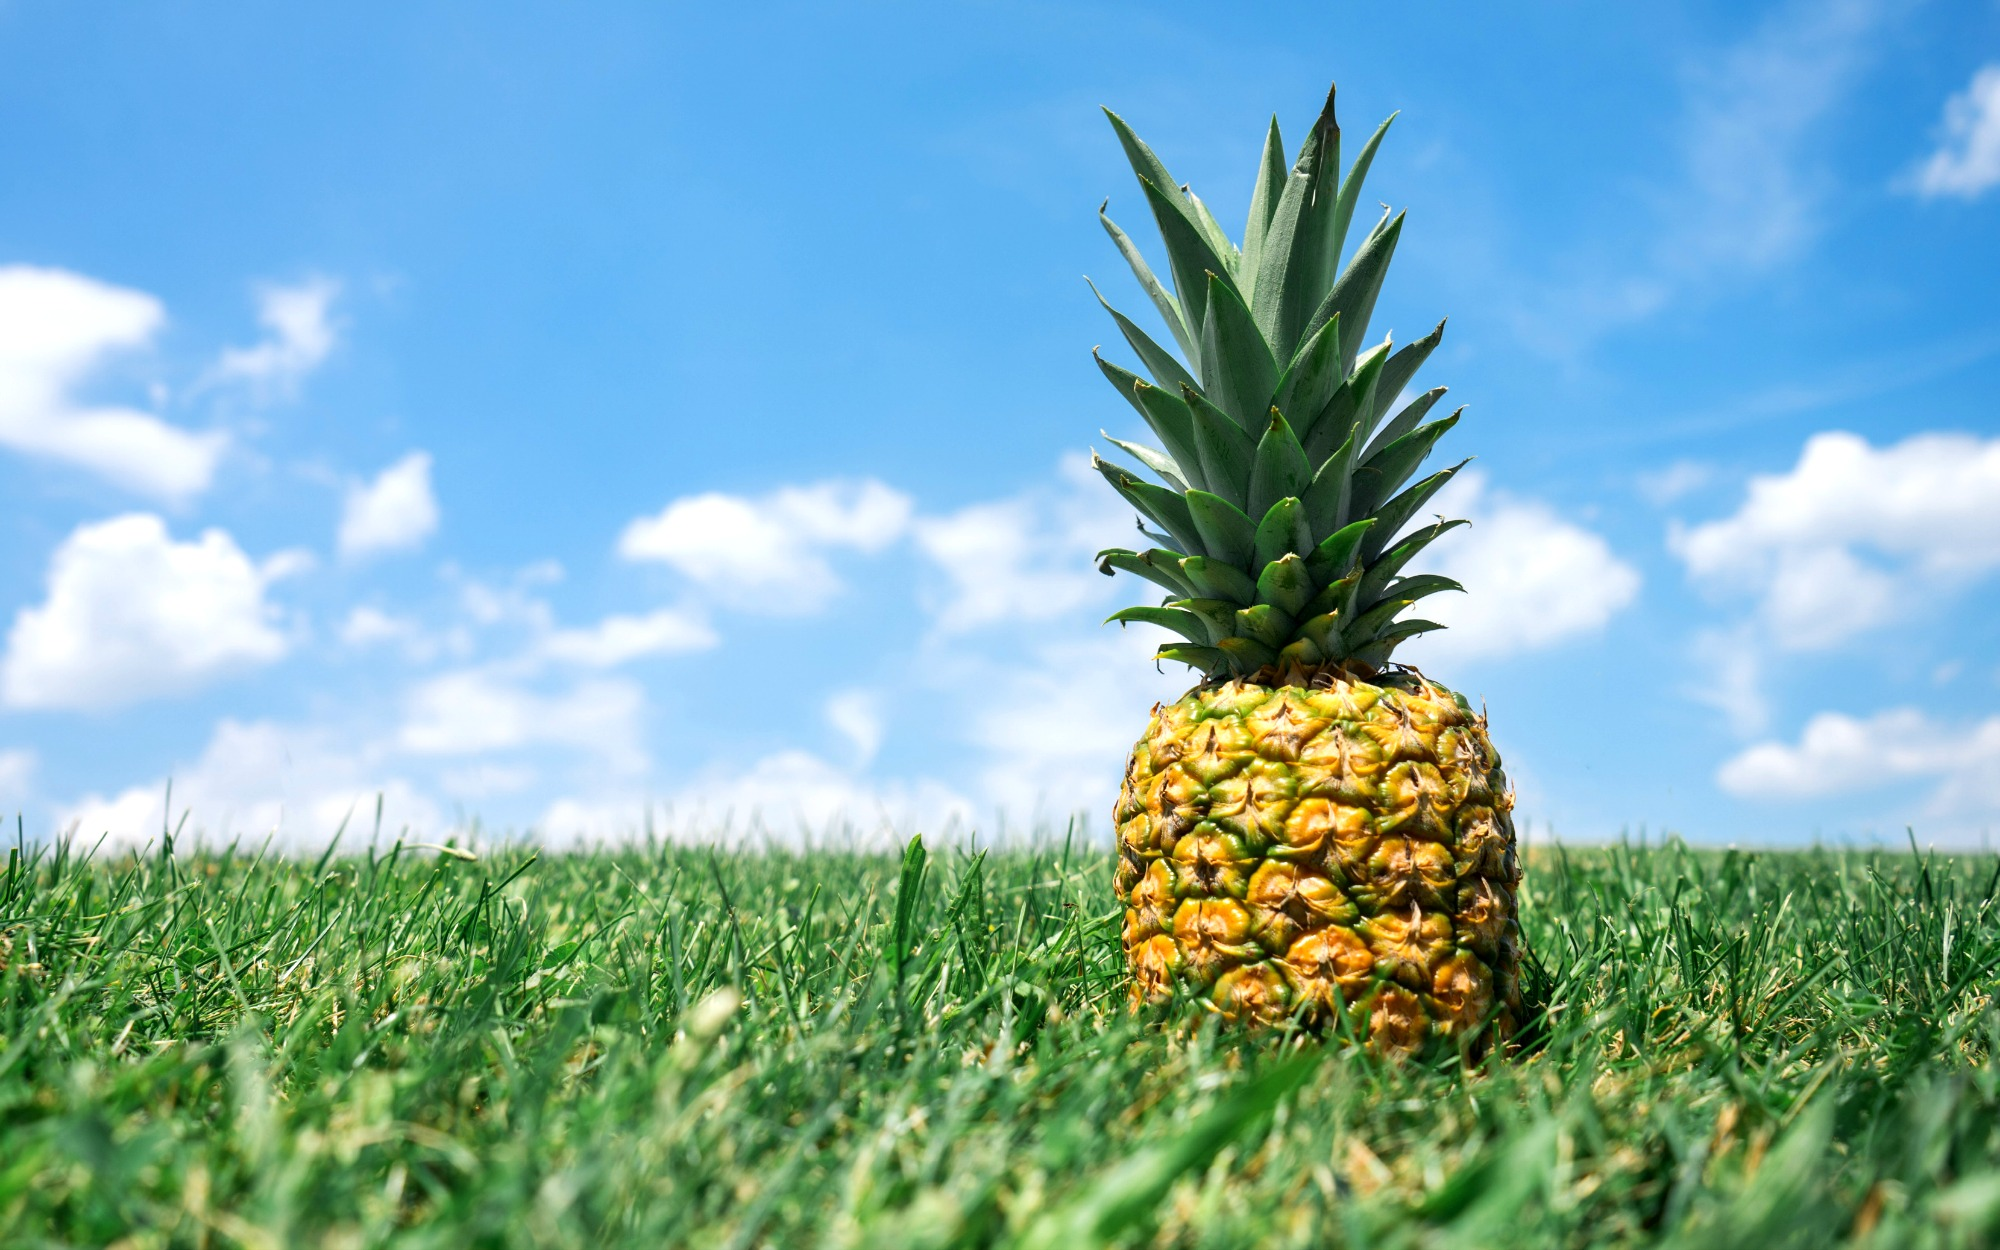 Photo credit: Pineapples.io / Unsplash